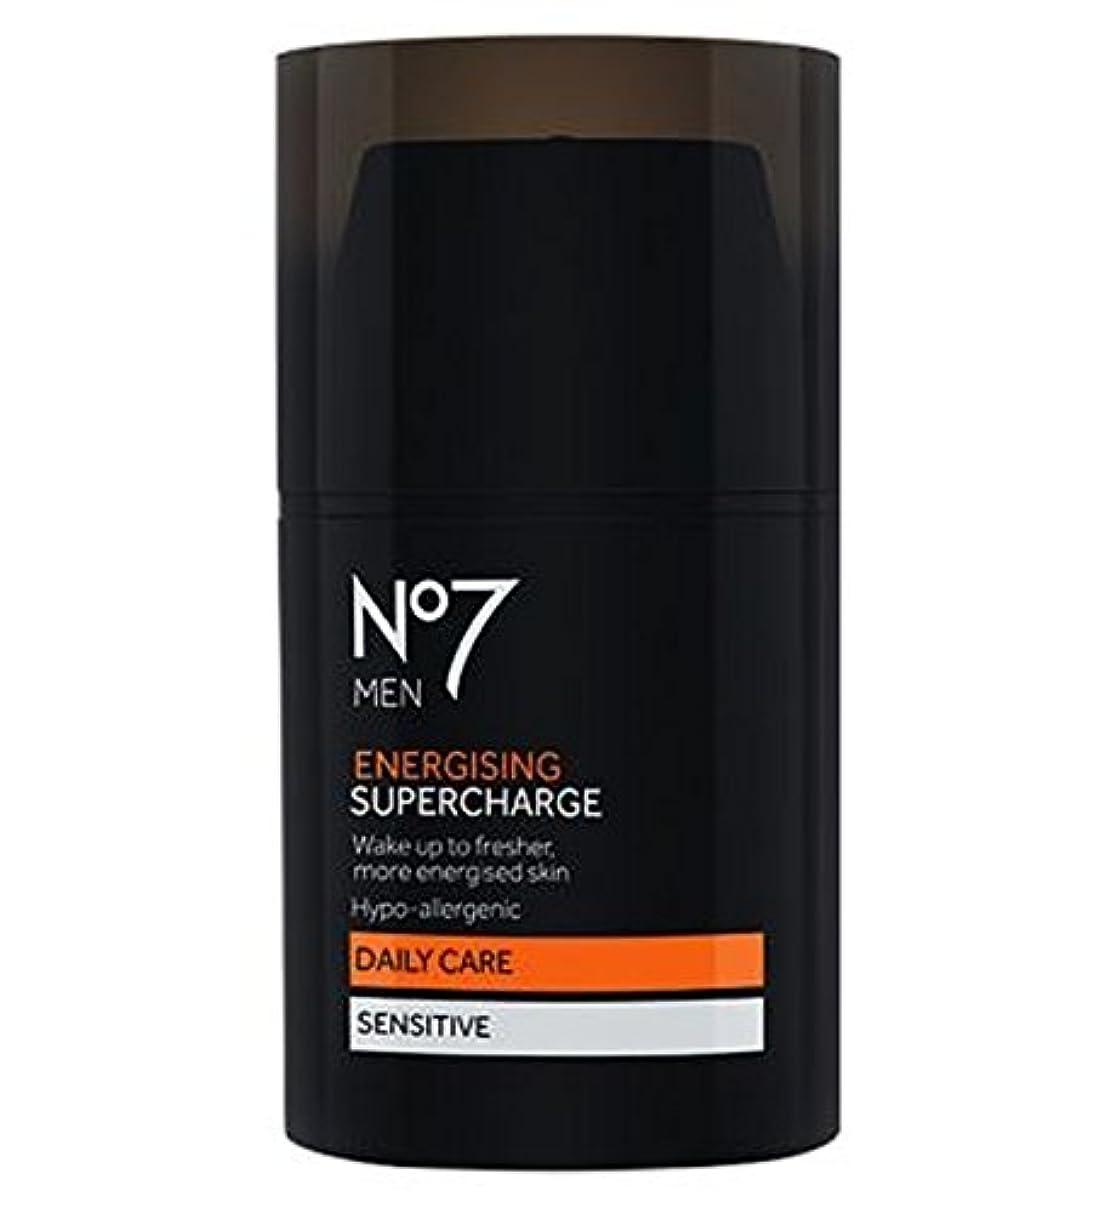 No7 Men Energising Supercharge - 過給を通電No7の男性 (No7) [並行輸入品]